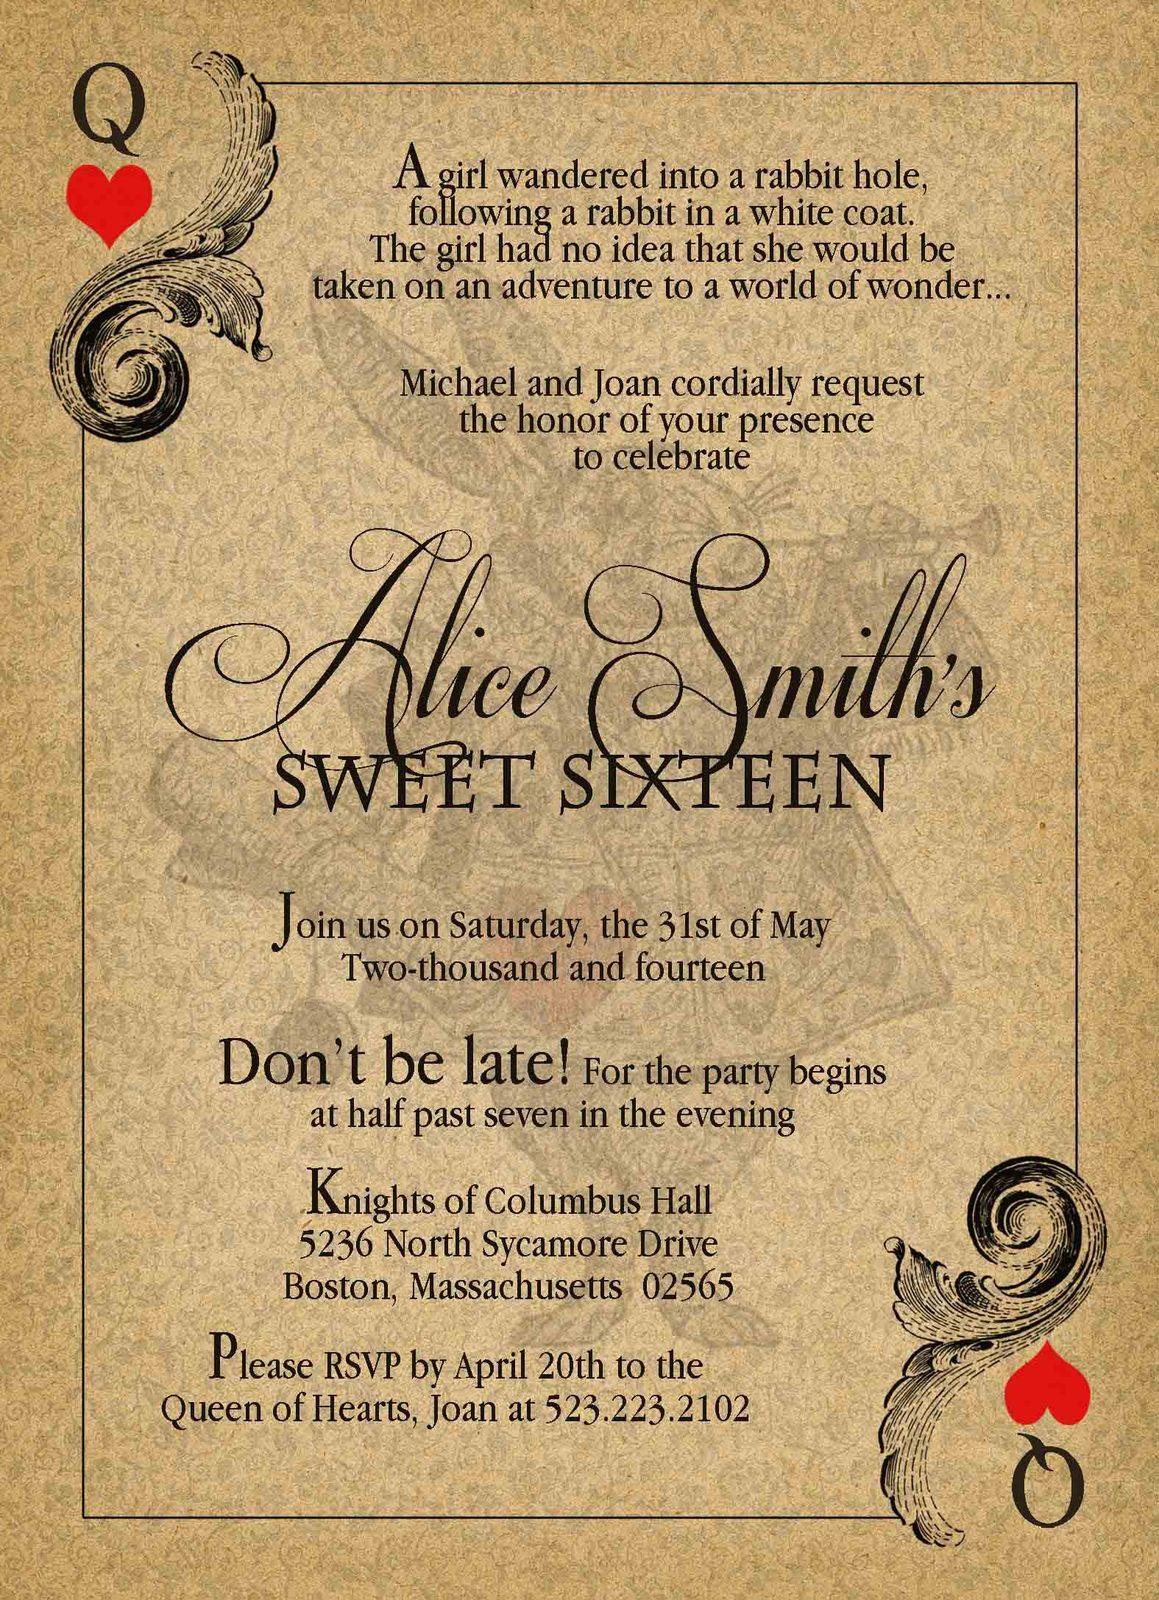 Alice in Wonderland Vintage Sweet Sixteen Birthday Invitation Queen of Hearts